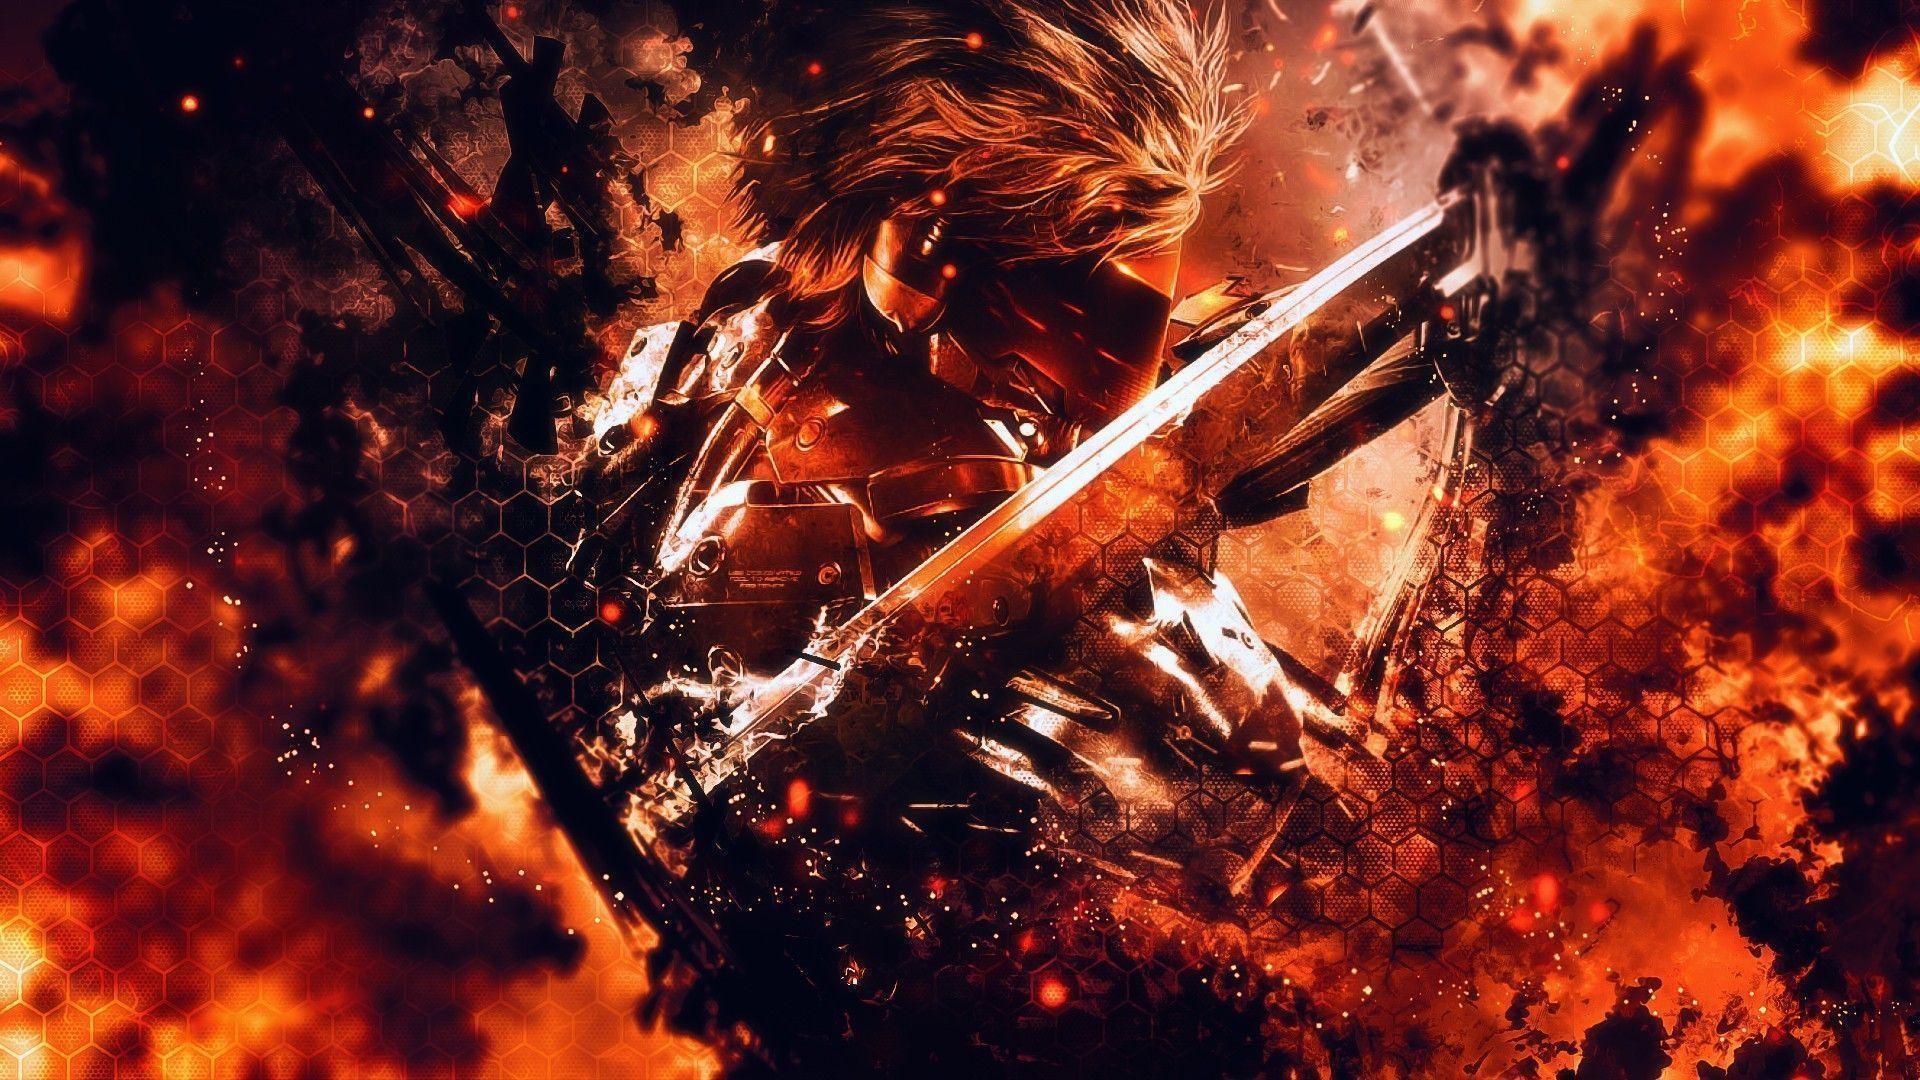 Flames Raiden Metal Gear Rising Revengeance Mgr Wallpaper Mixhd .